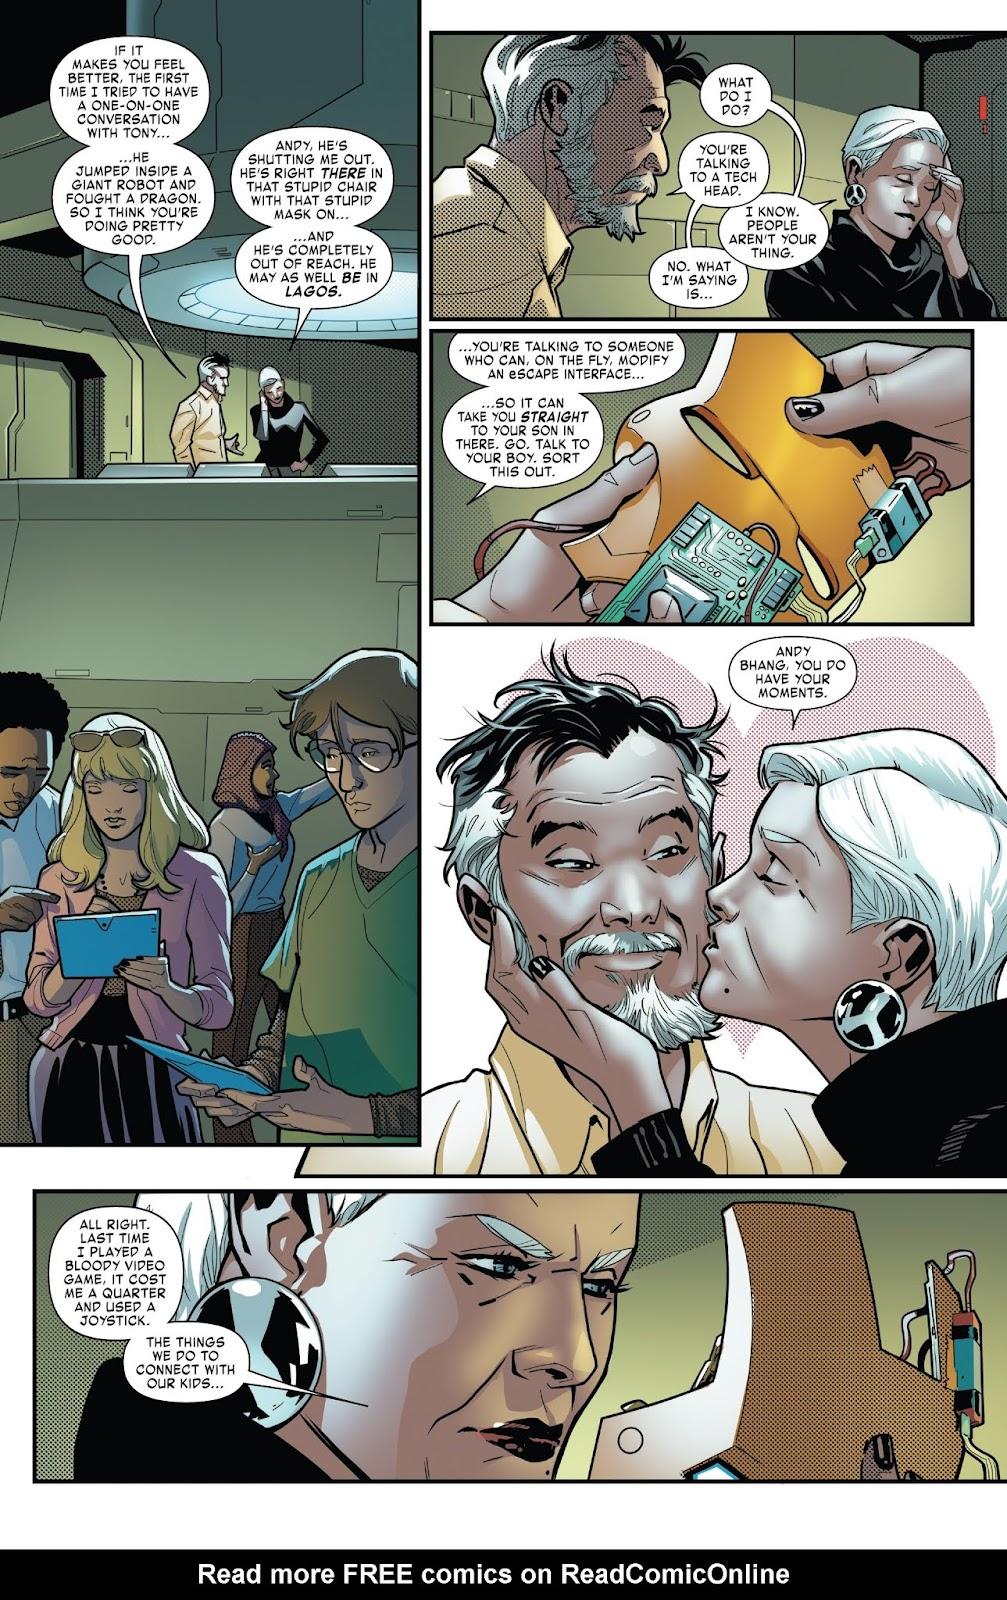 Read online Tony Stark: Iron Man comic -  Issue #6 - 16